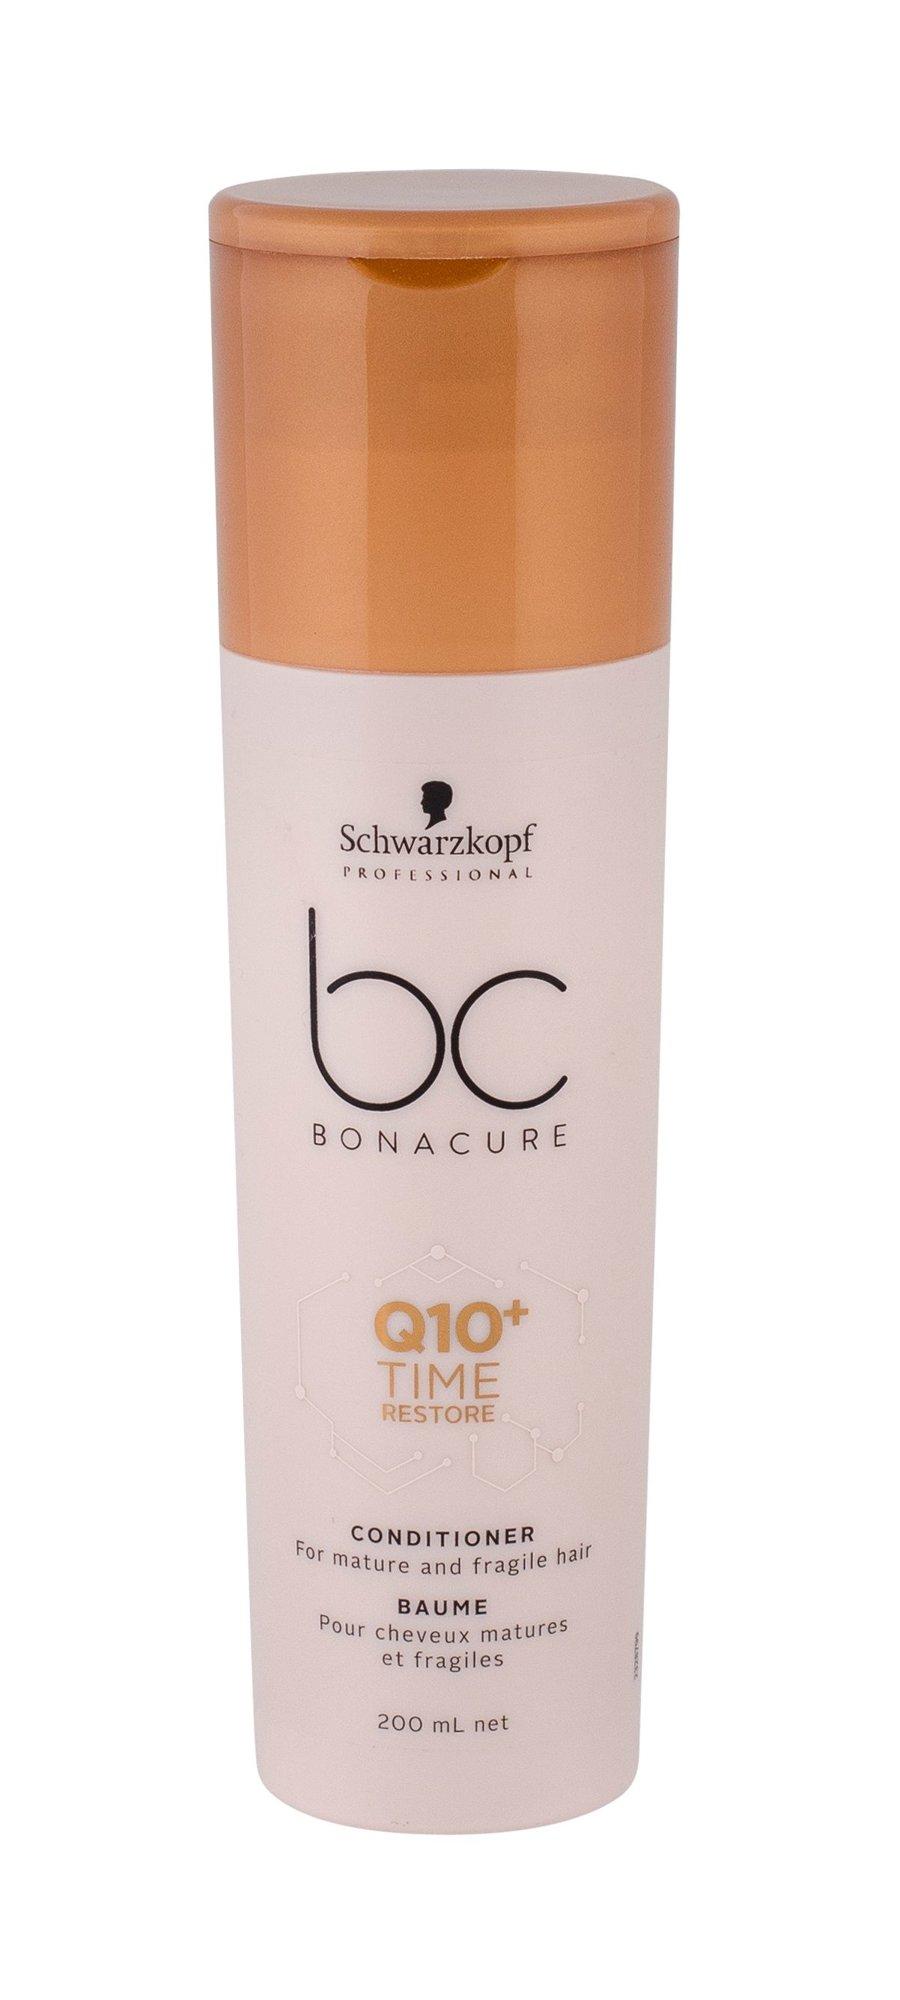 Schwarzkopf BC Bonacure Q10+ Time Restore Conditioner 200ml